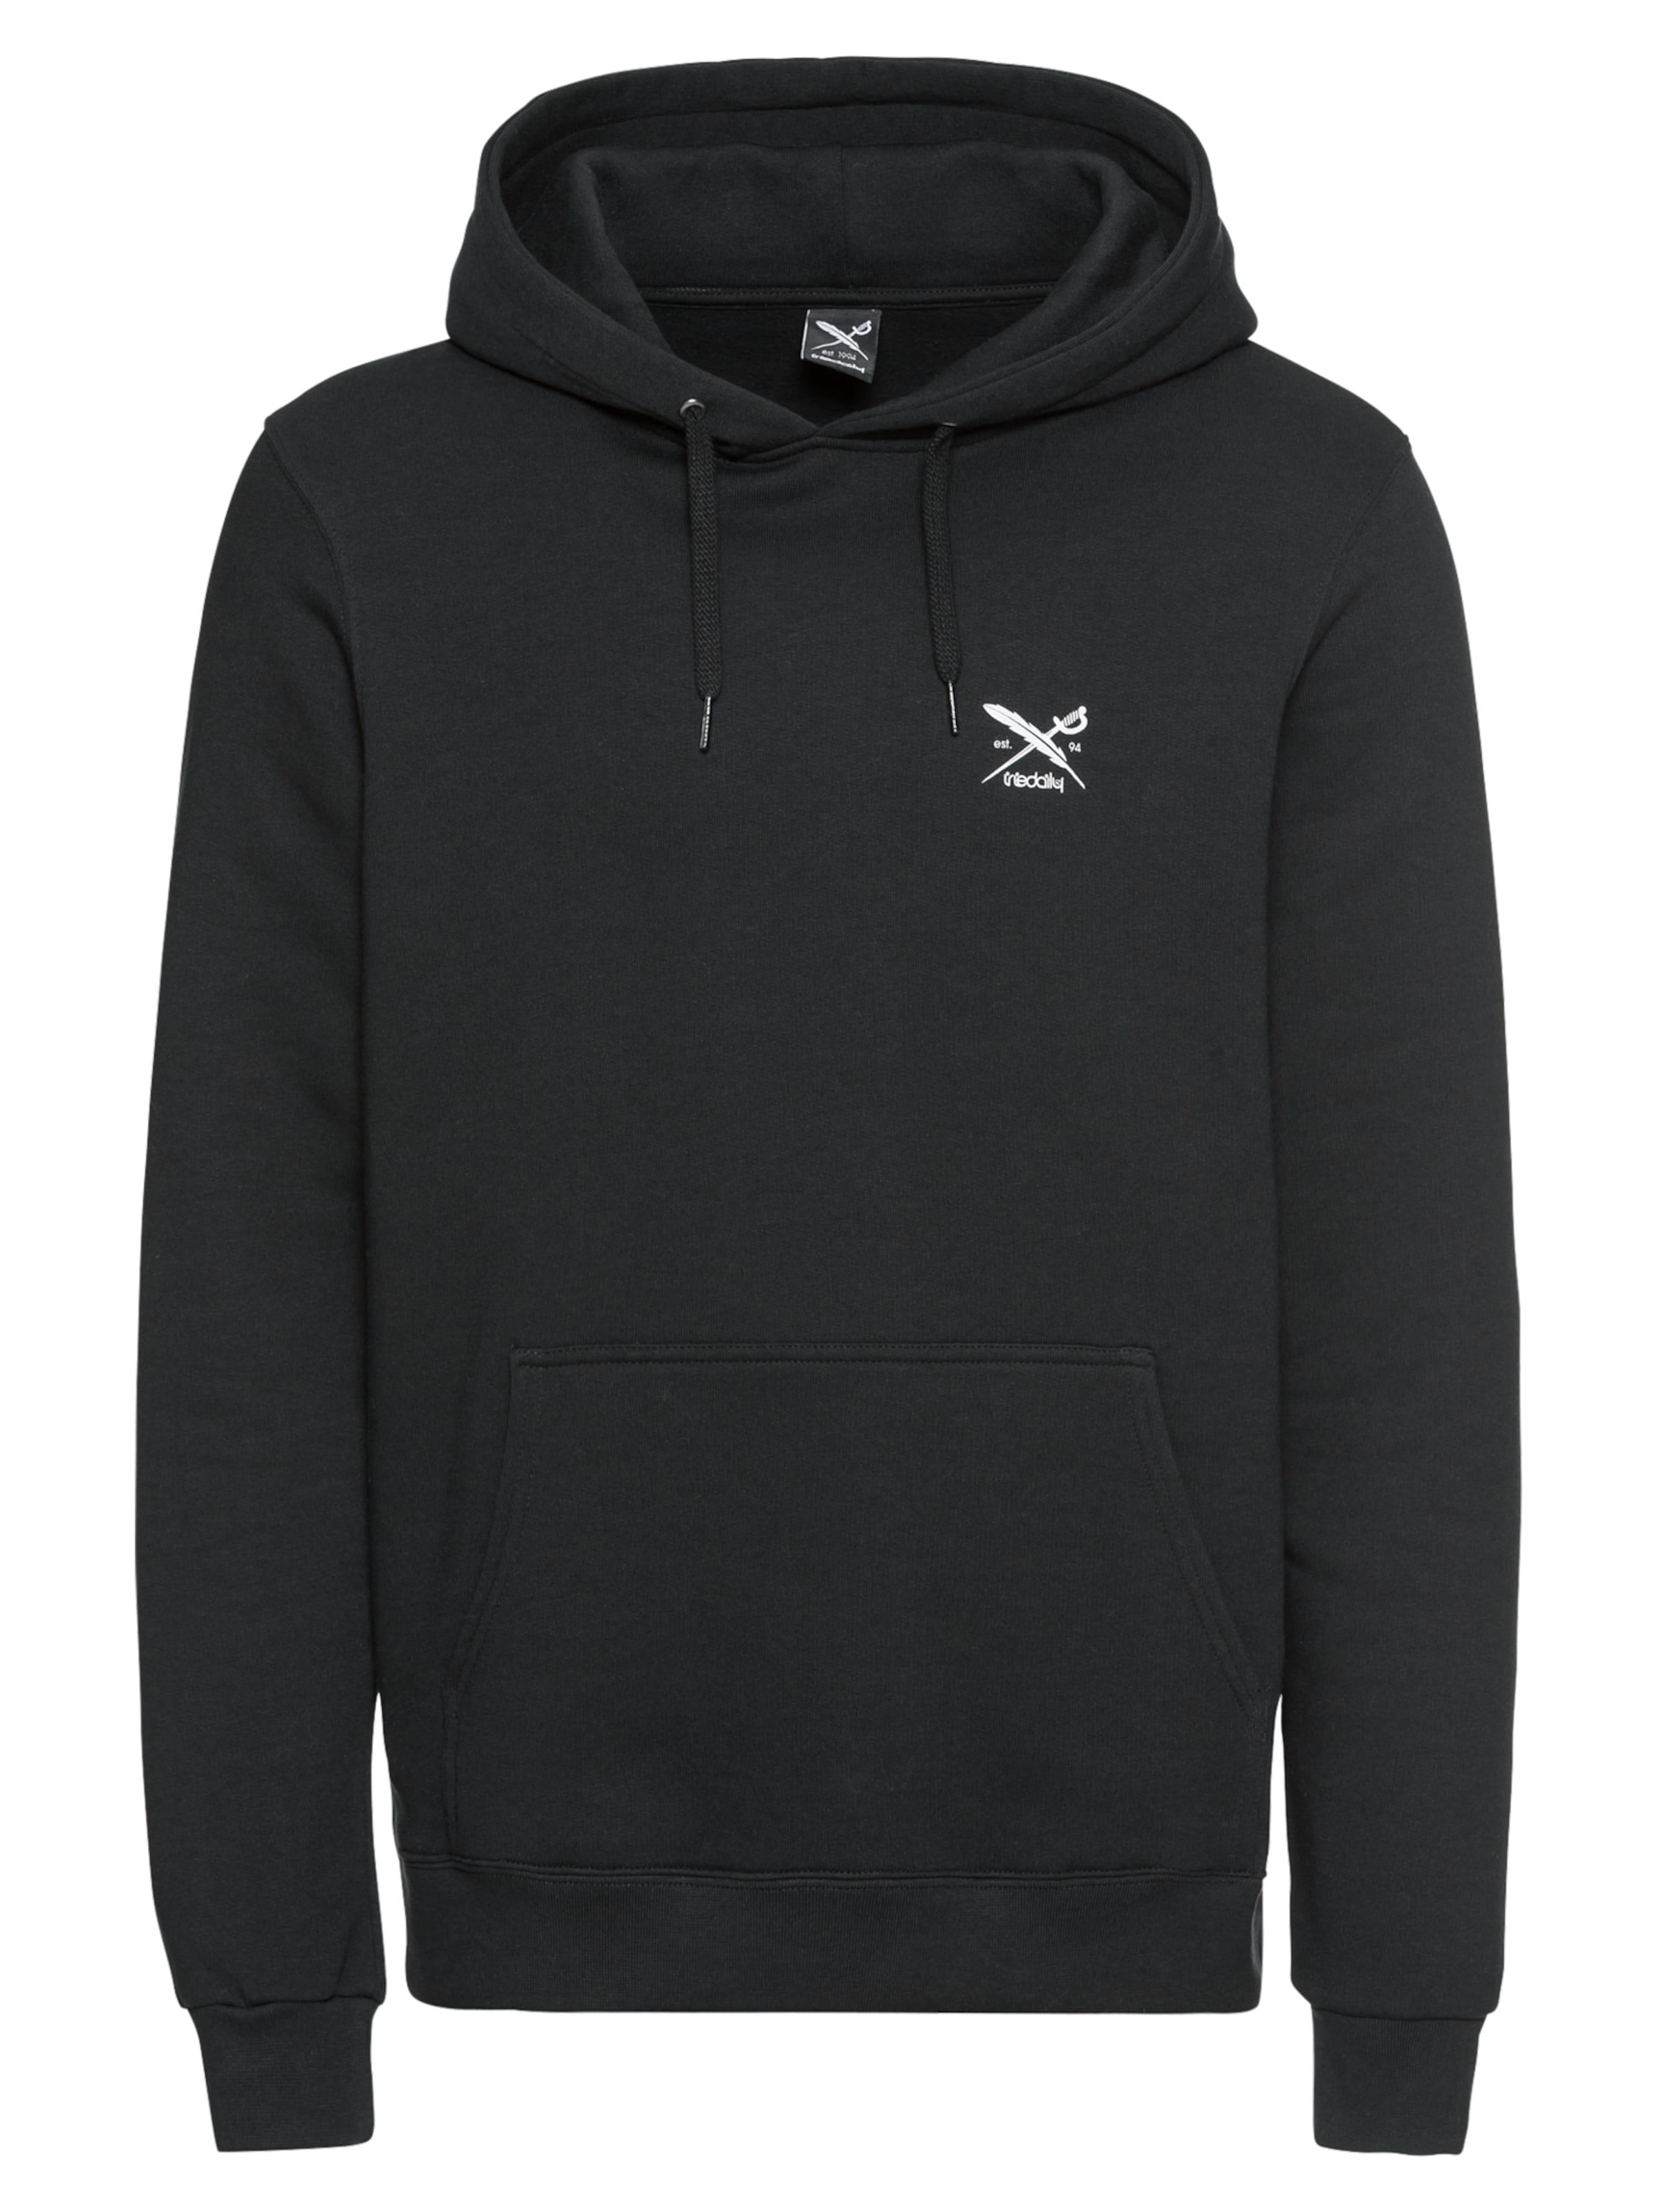 Sweatshirt Iriedaily Momentum 'new In Hoody' SchwarzWeiß Rjq4LS3Ac5